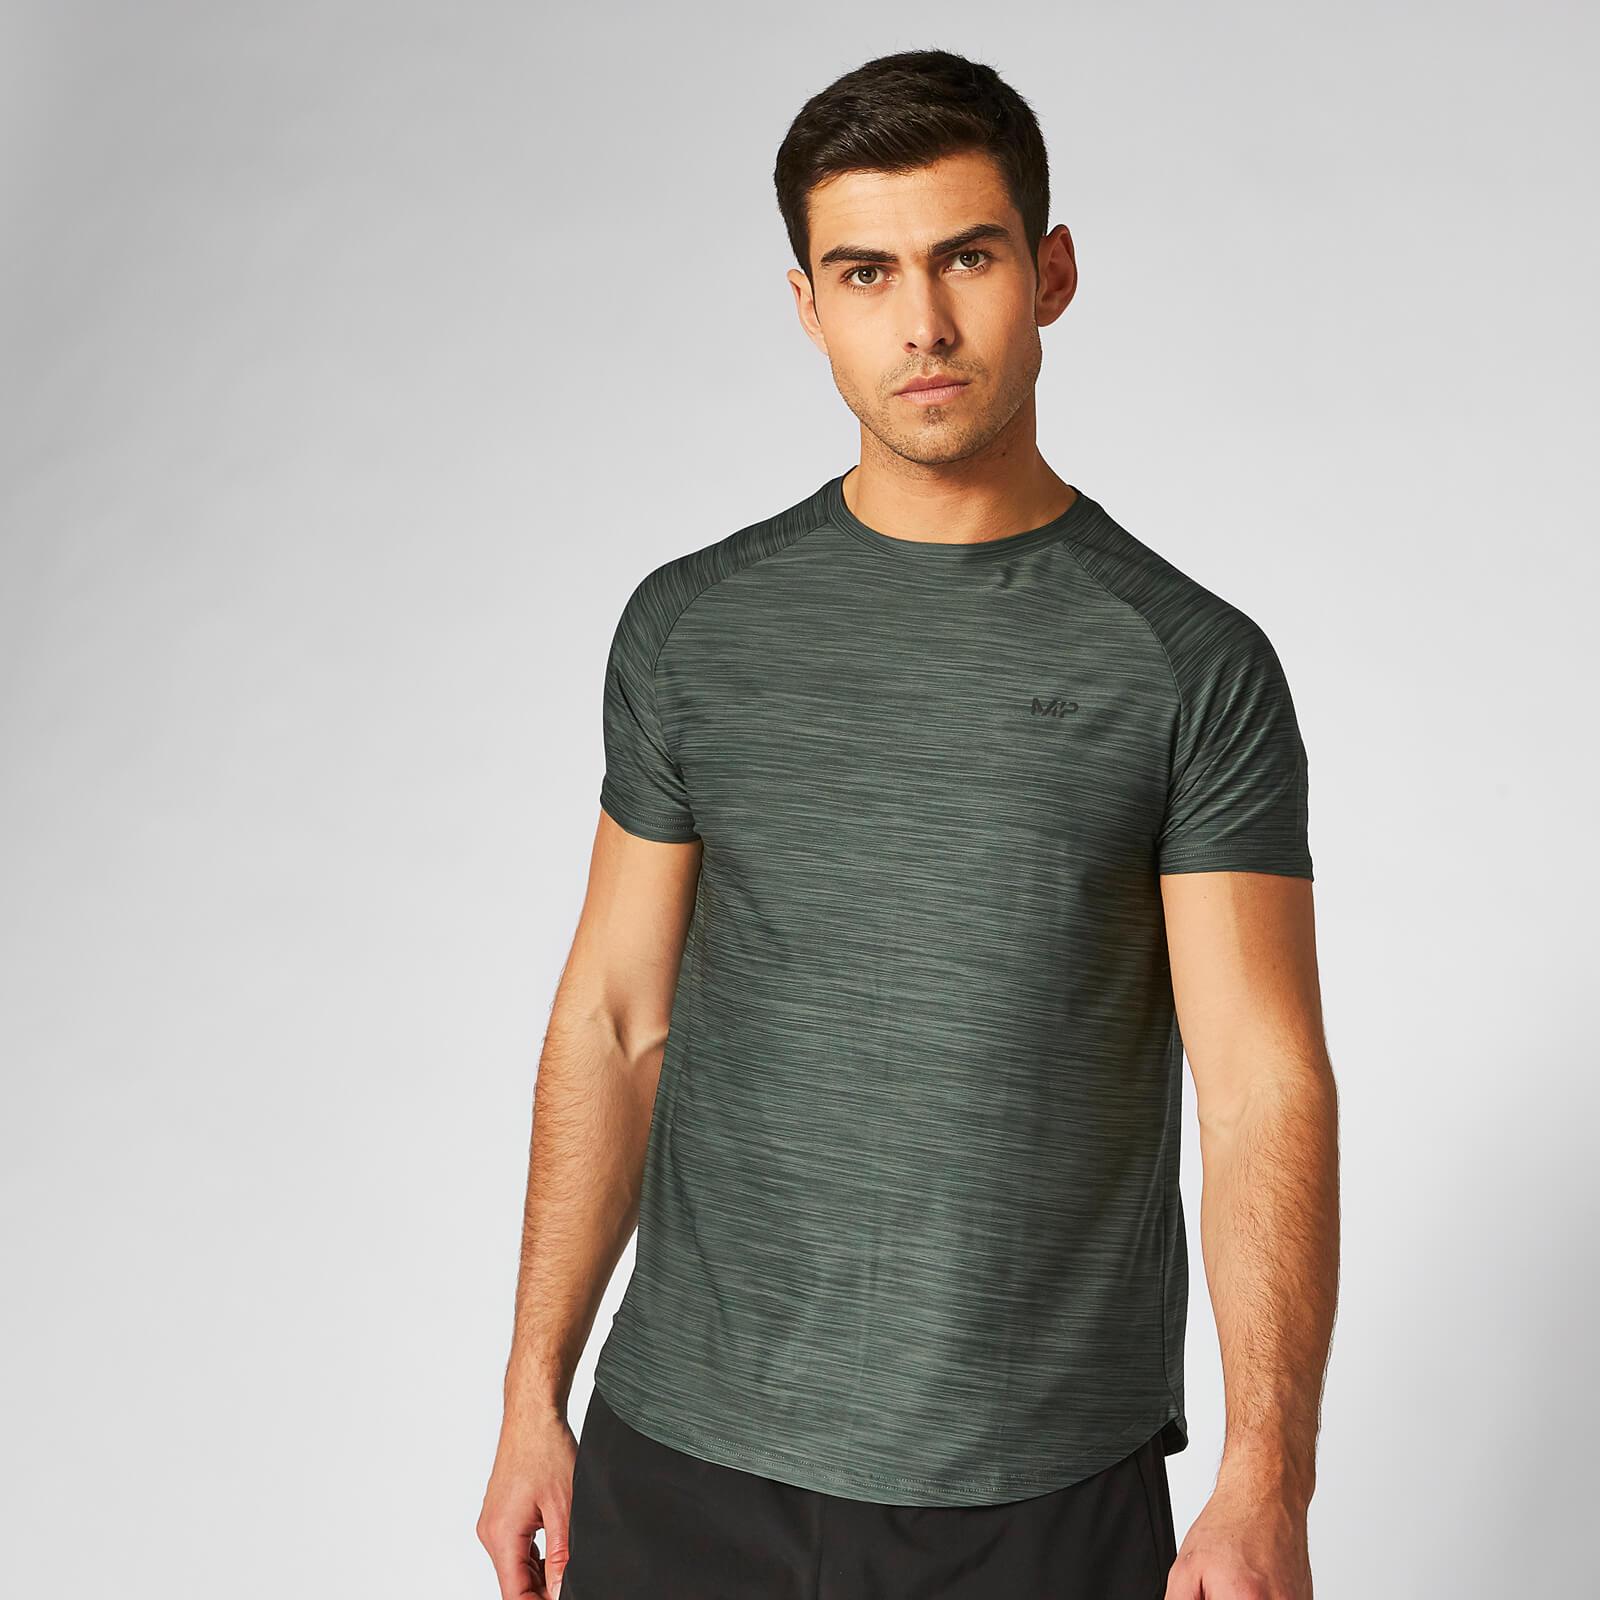 Myprotein Dry-Tech Infinity T-Shirt - Pine Marl - XL